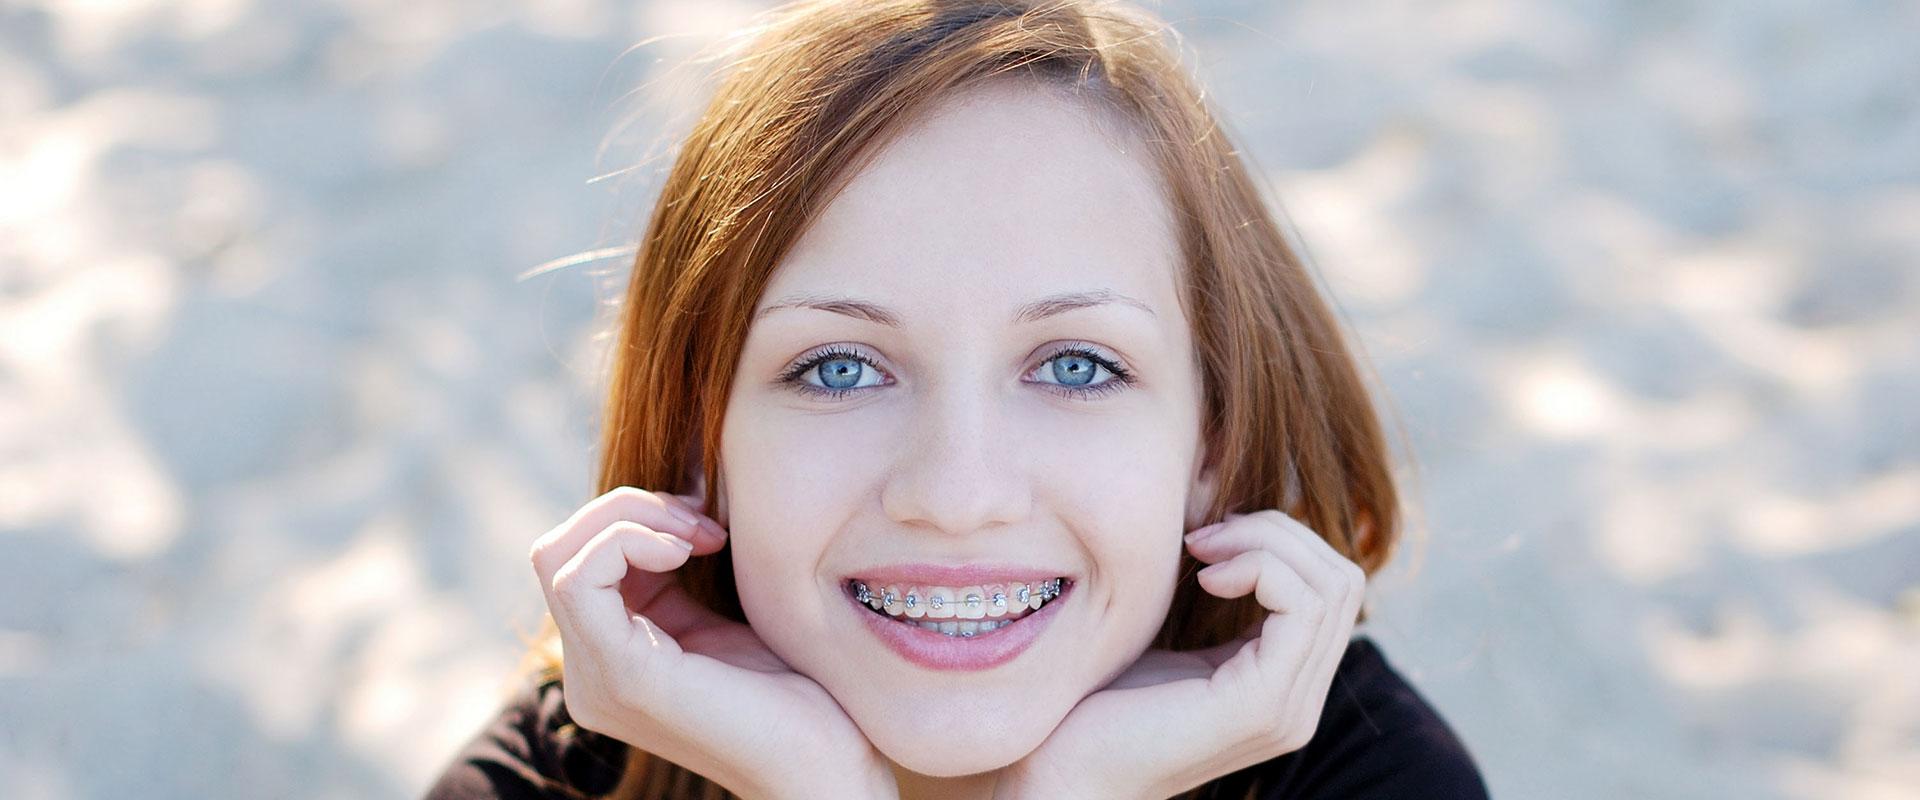 4new-era-of-orthodontic-treatment